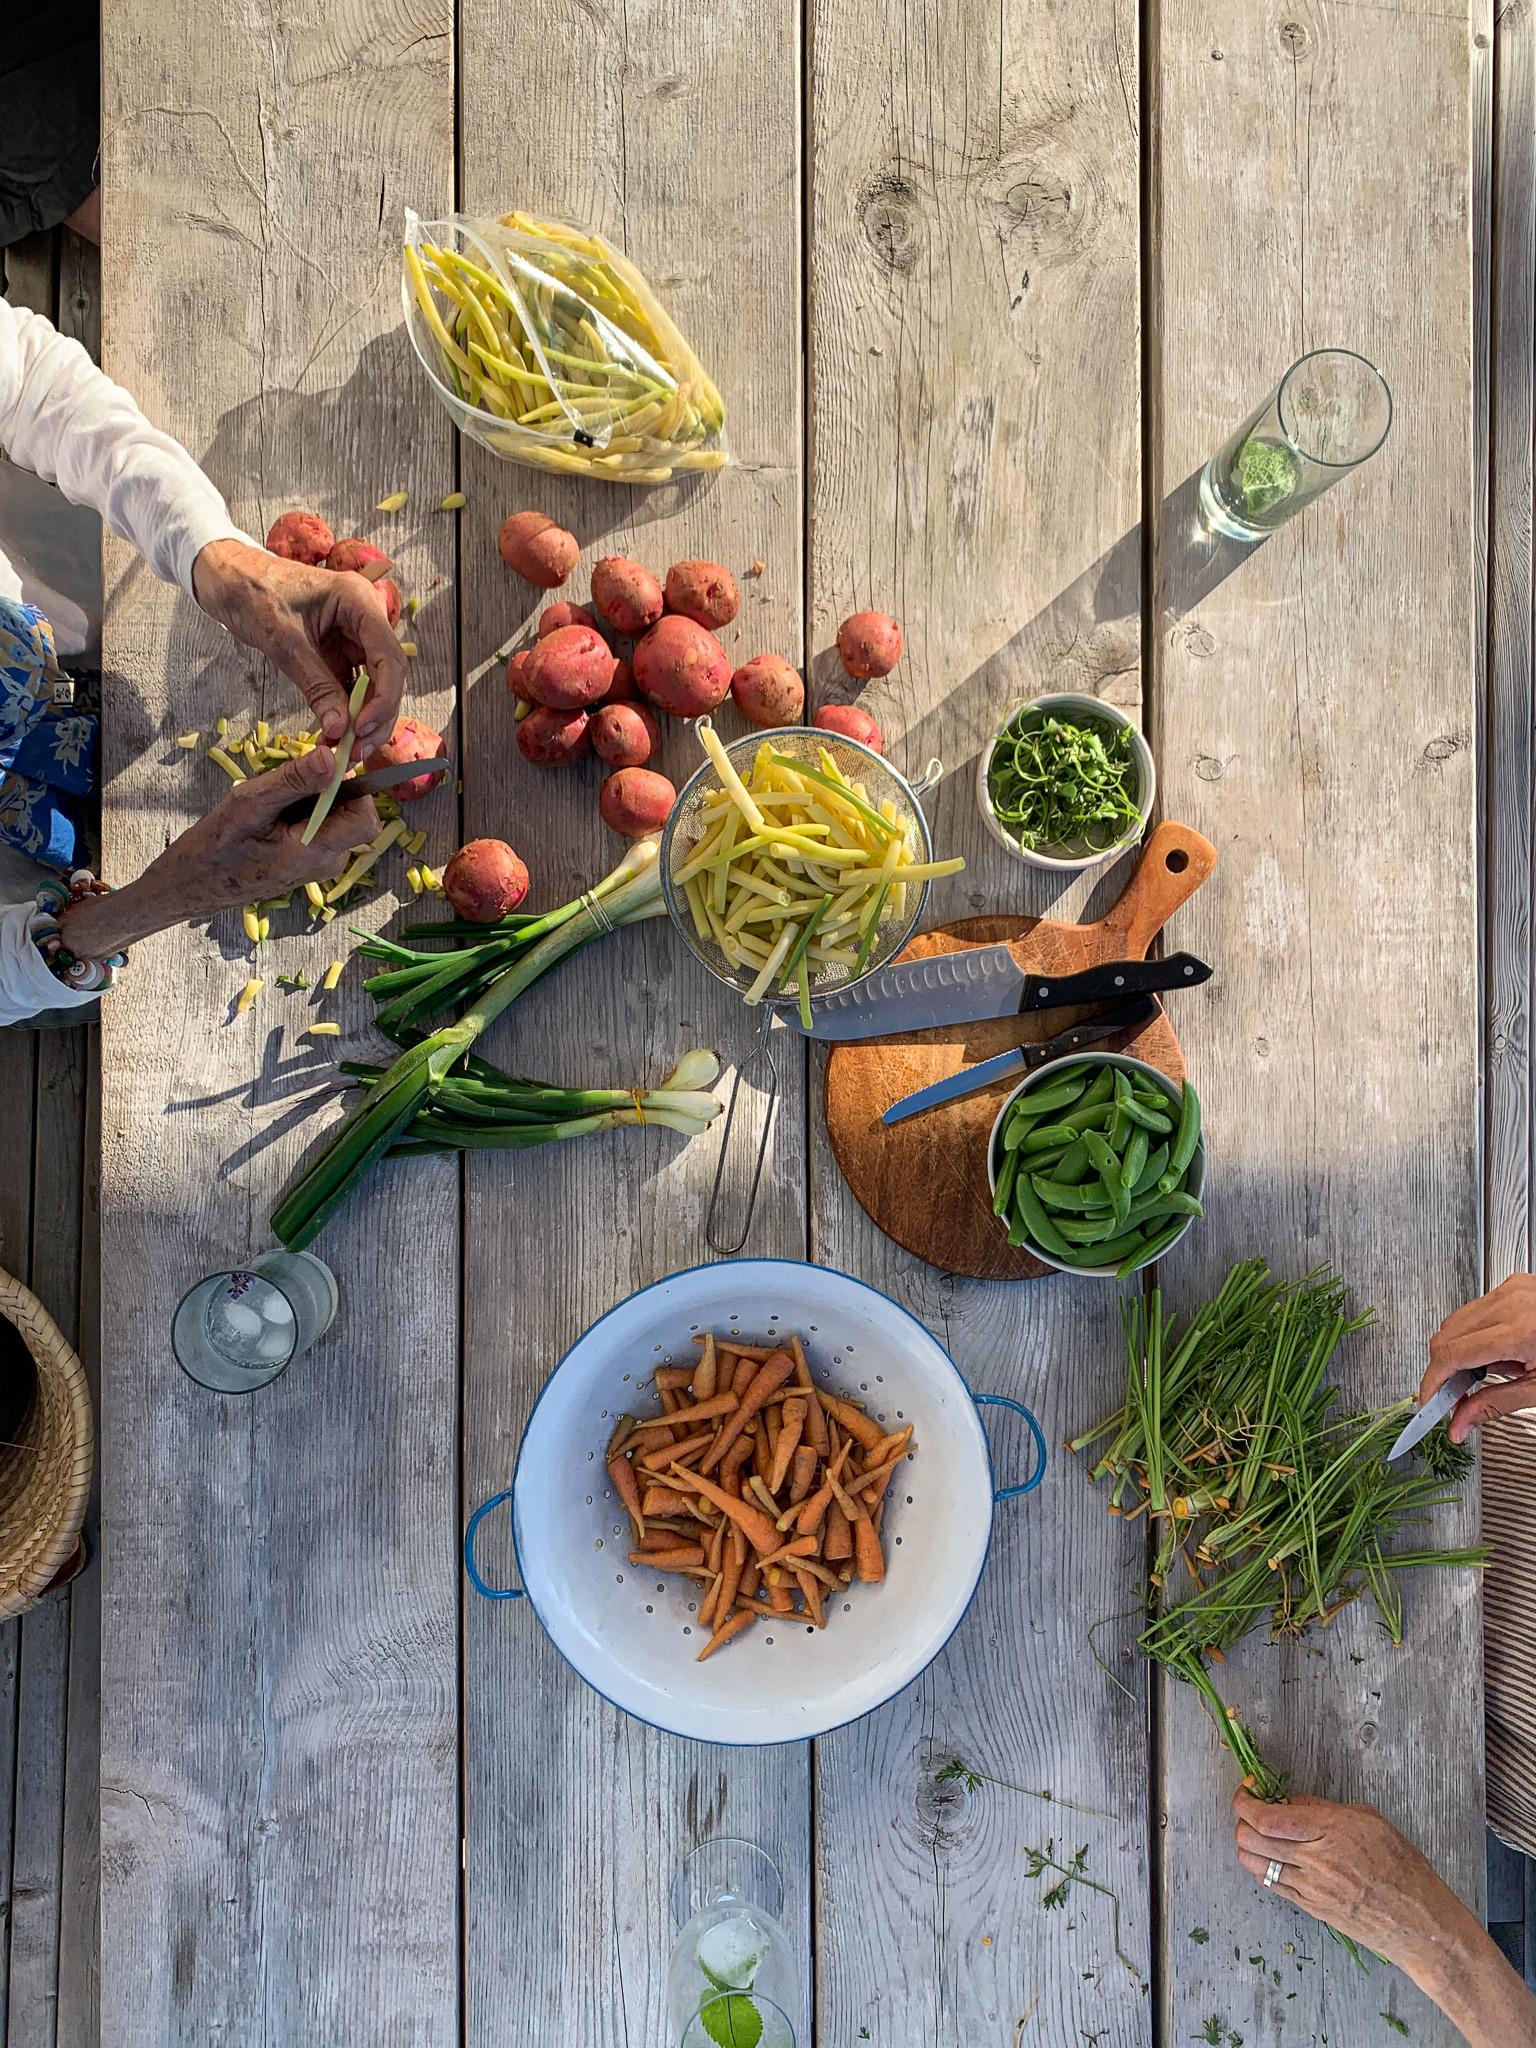 hodge podge vegetables